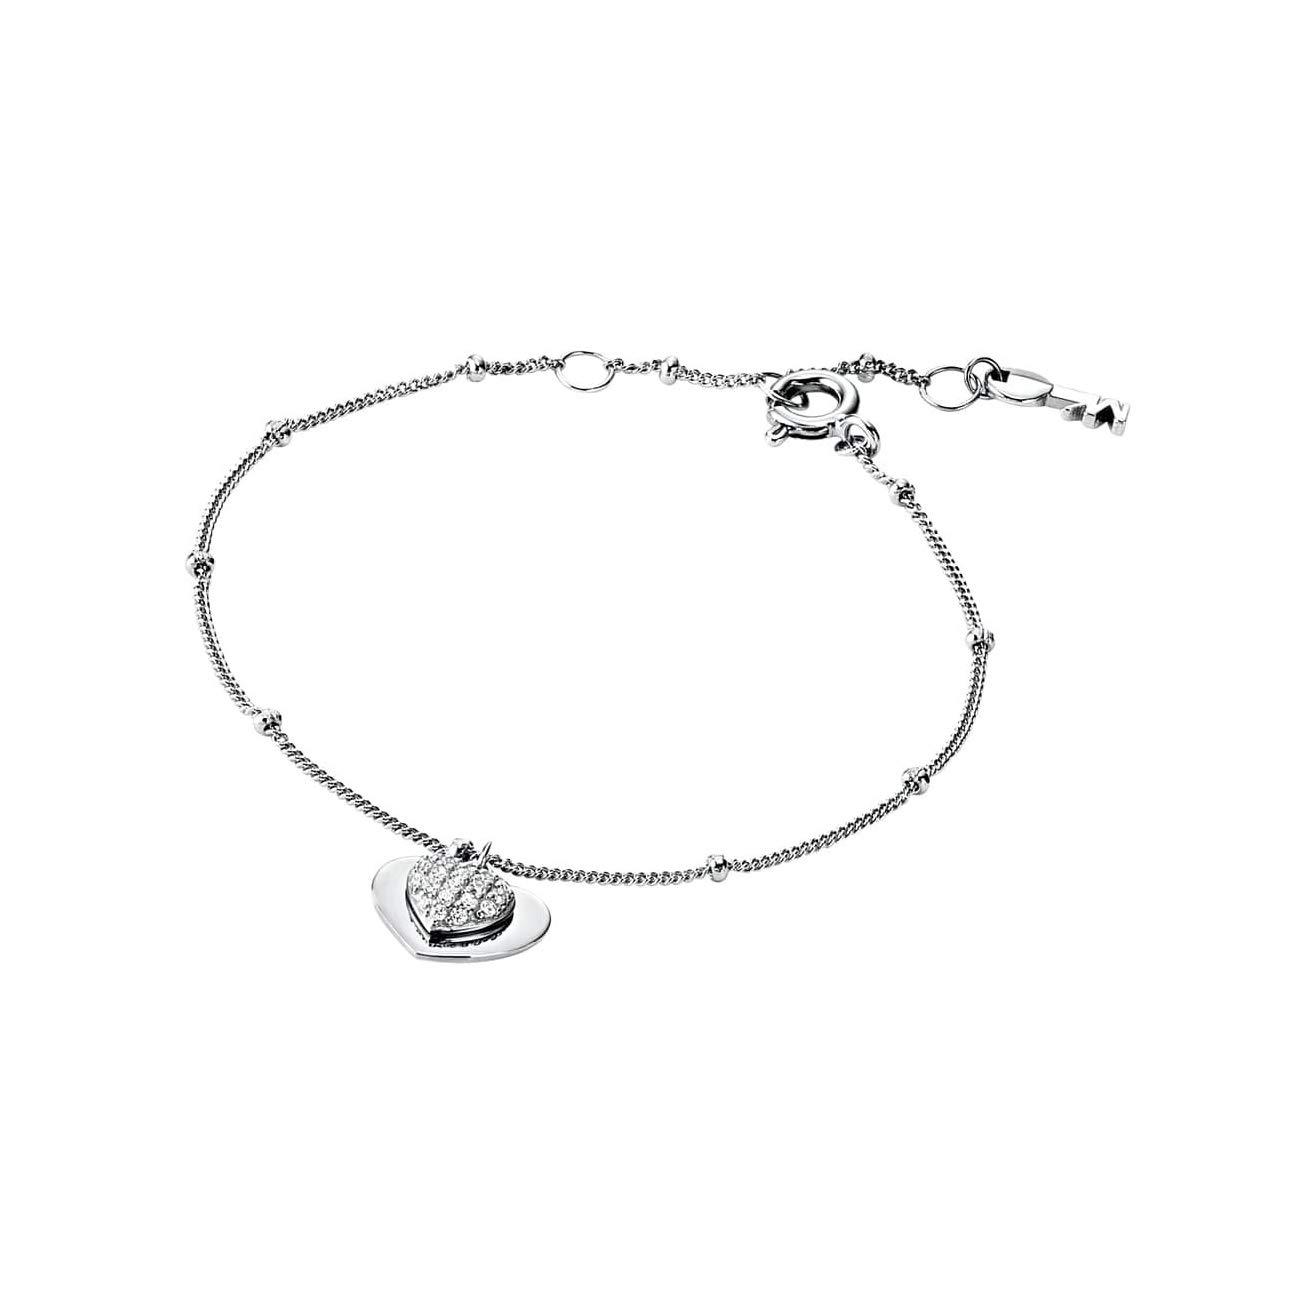 Michael Kors Damen Armband Sterling Silber 925 Pavé Herz